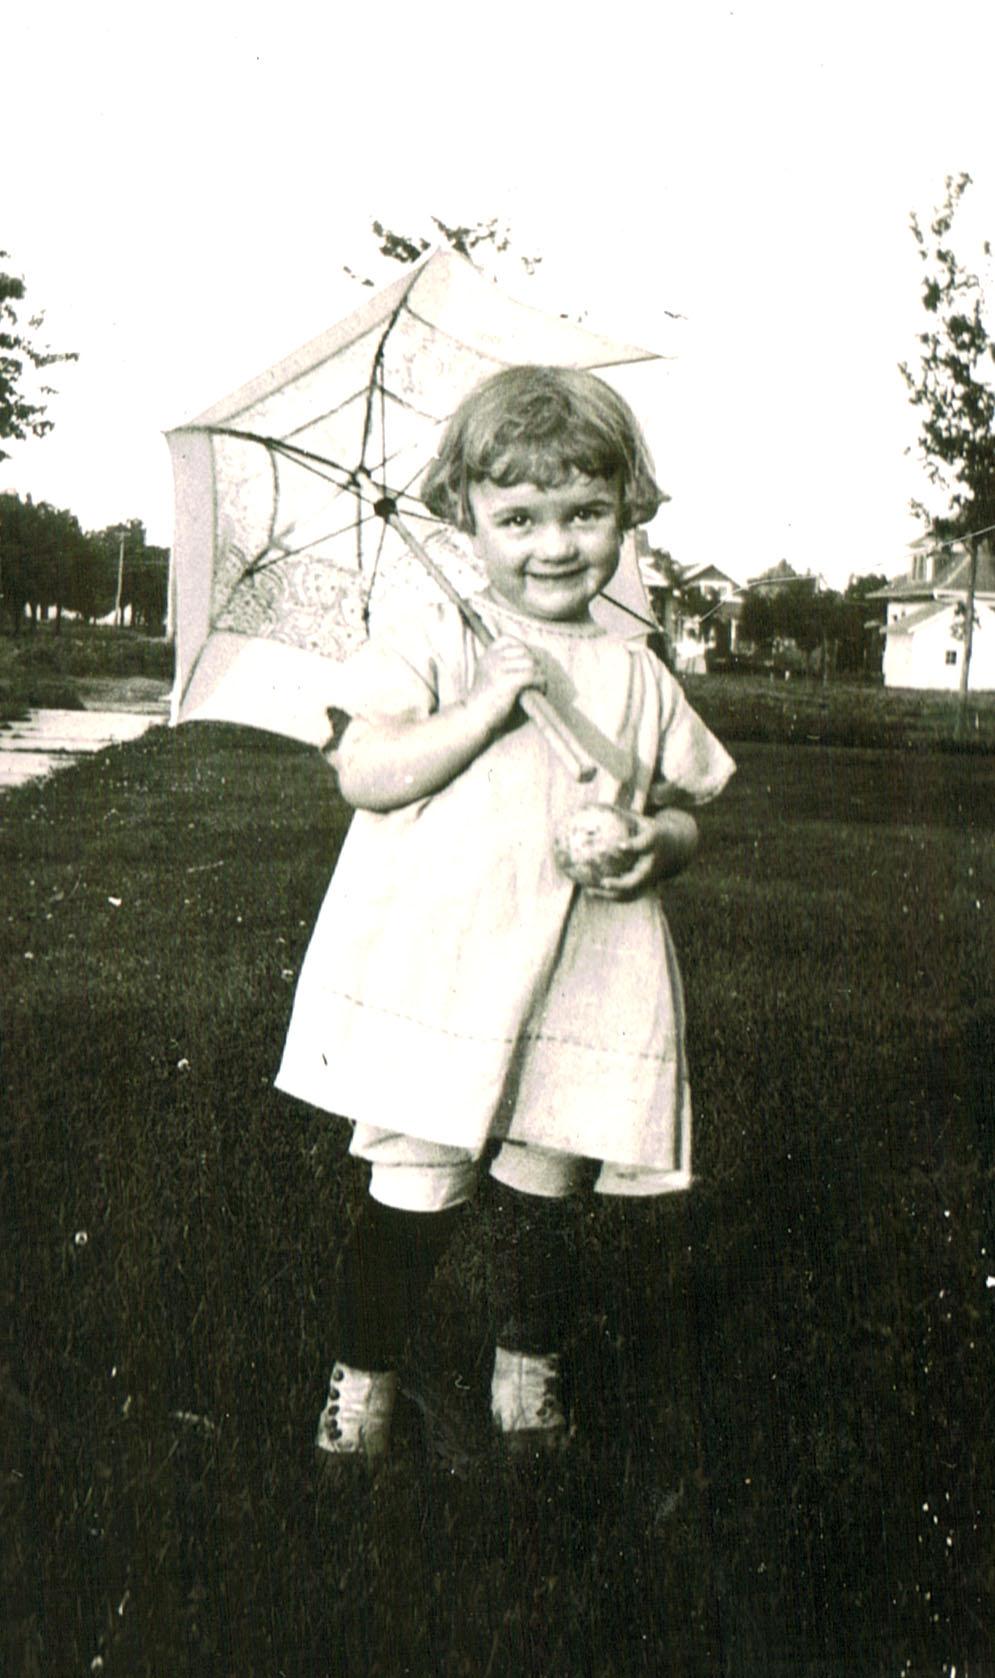 Vintage Photo 19 by Falln-Stock